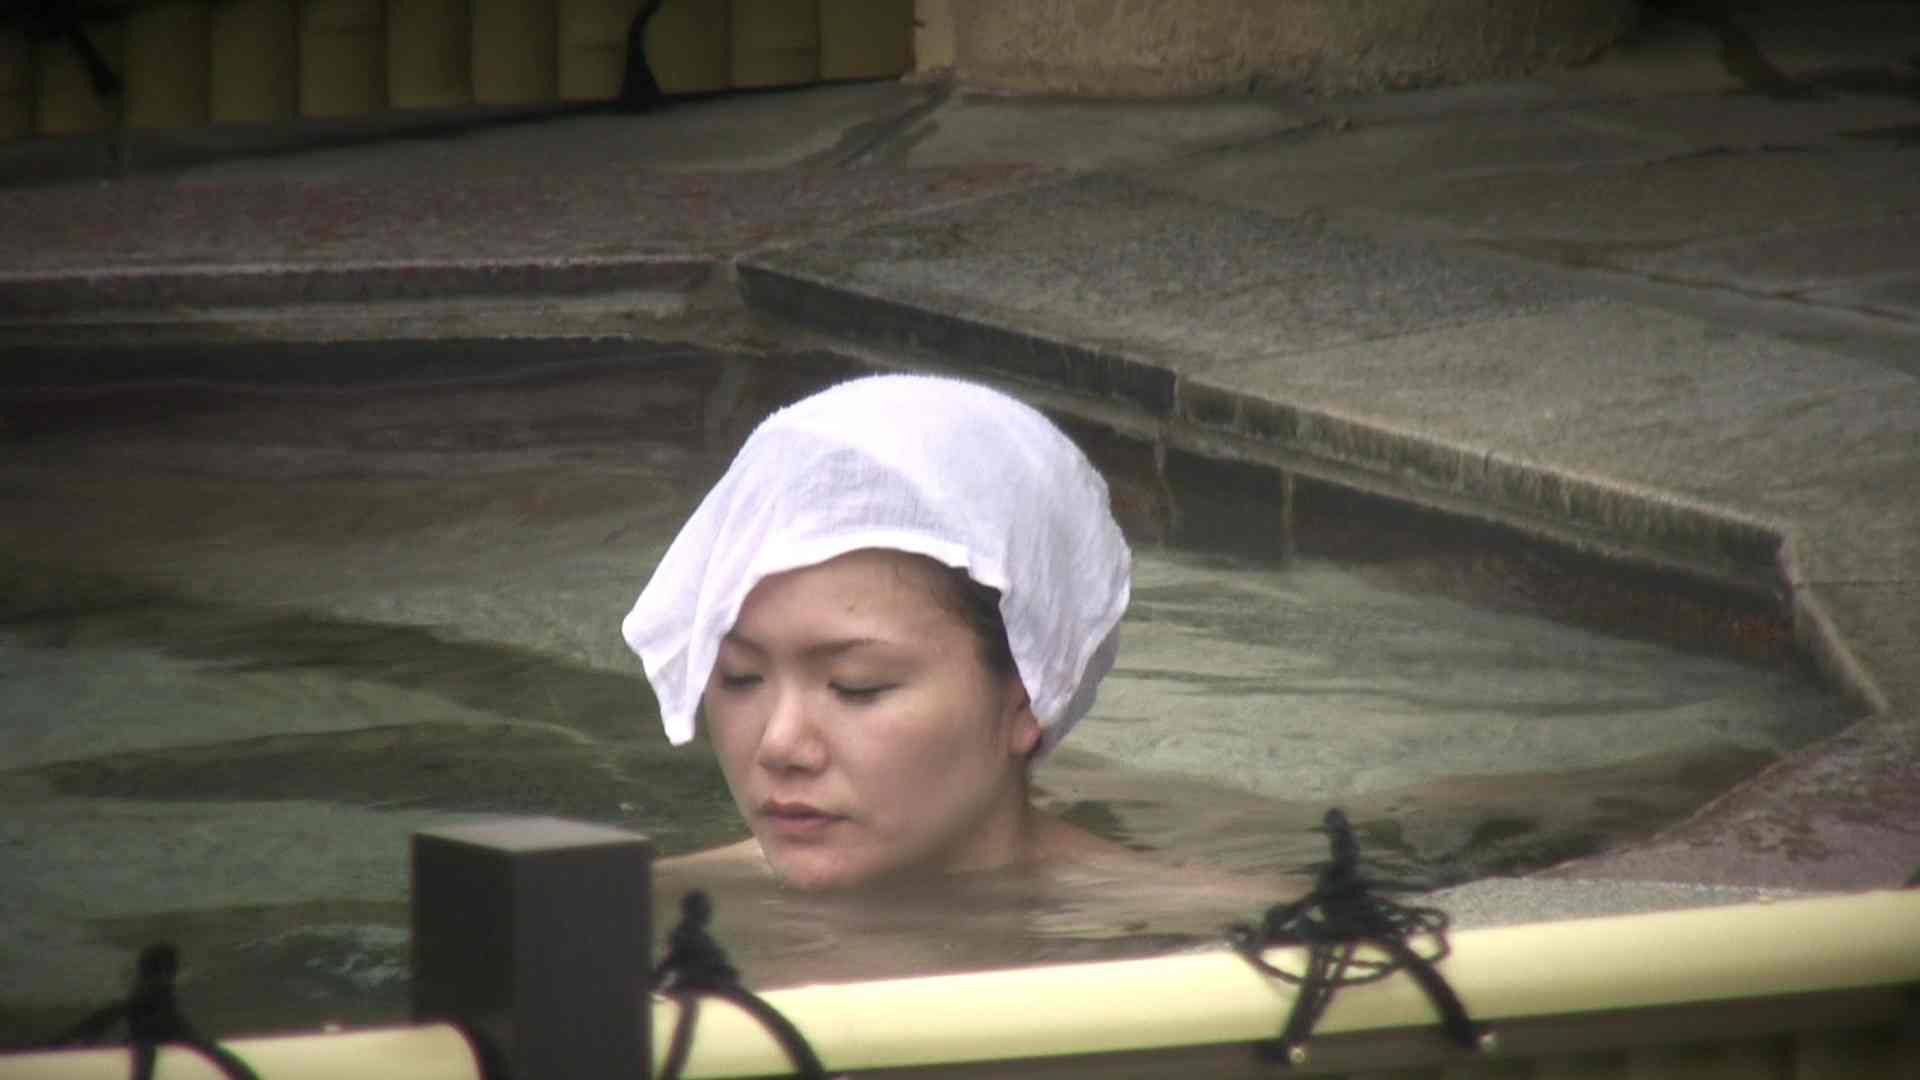 Aquaな露天風呂Vol.12【VIP】 HなOL | 盗撮  83pic 6